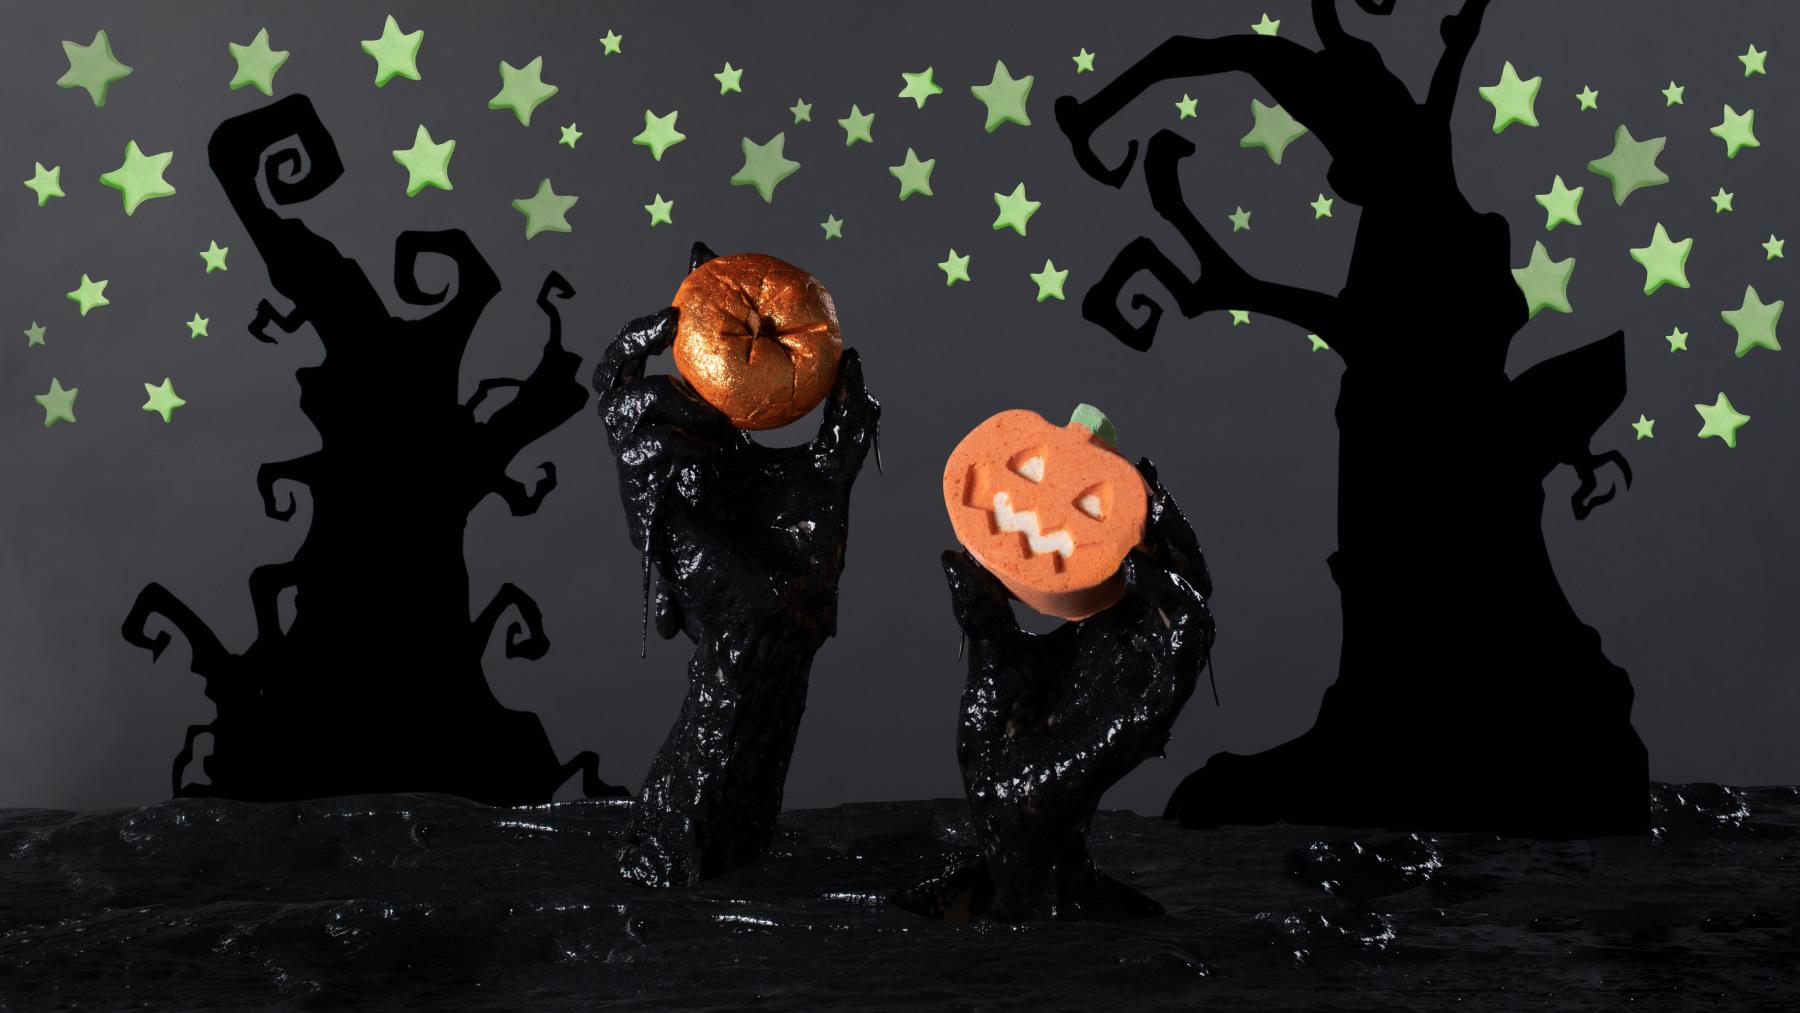 Lush Halloweenská kolekce